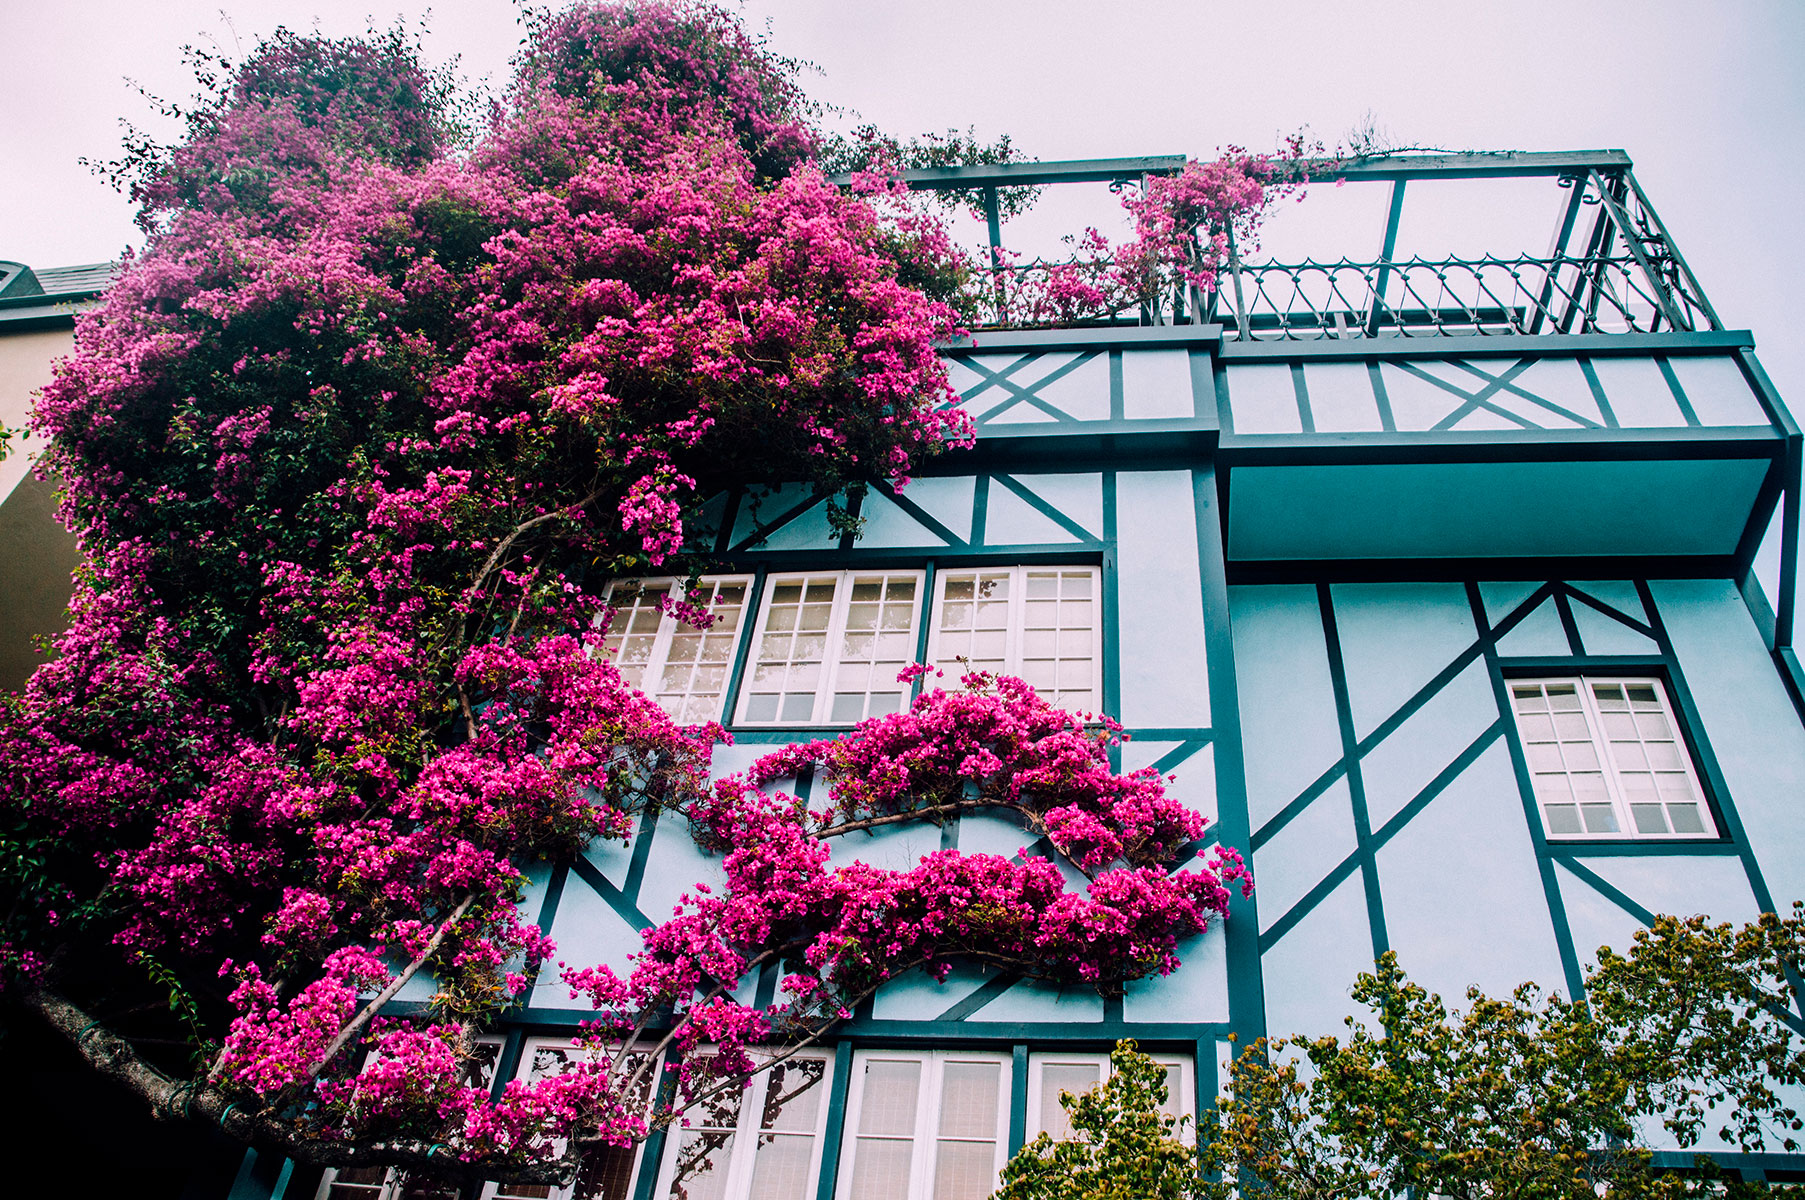 Maison fleurs lombard street san francisco